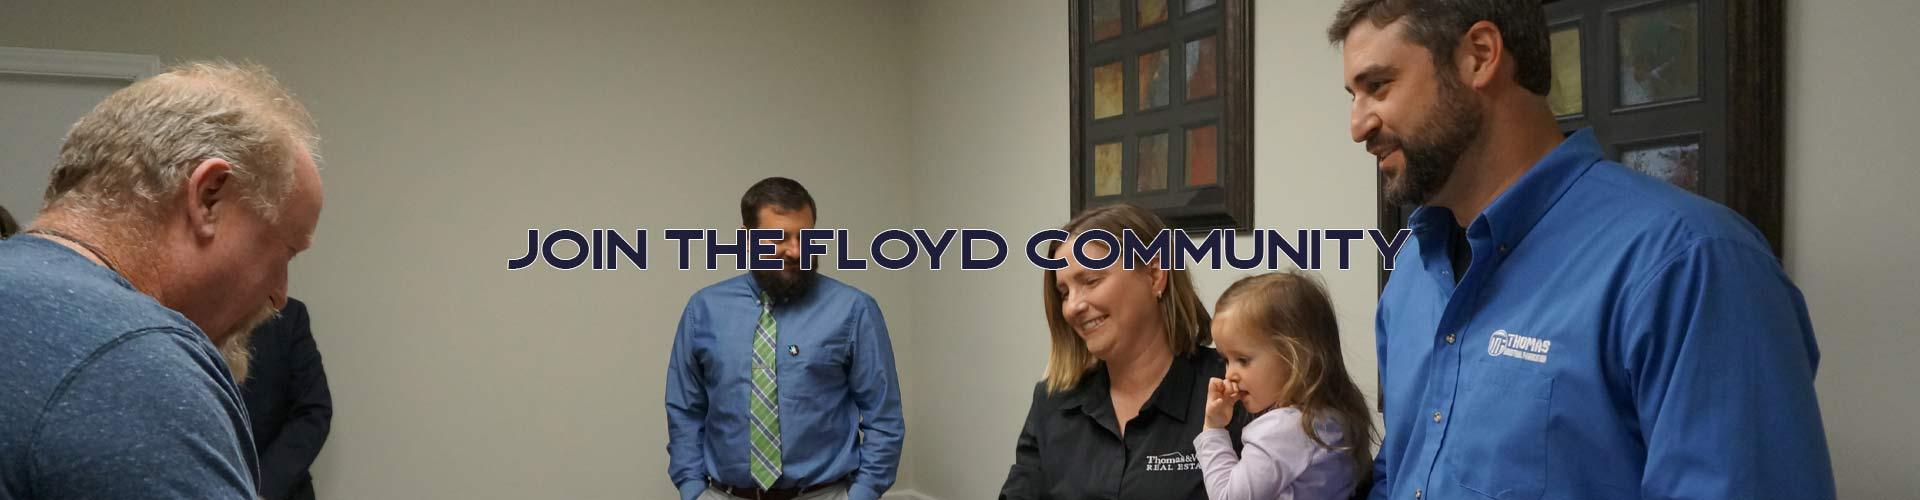 join-the-floyd-community-header